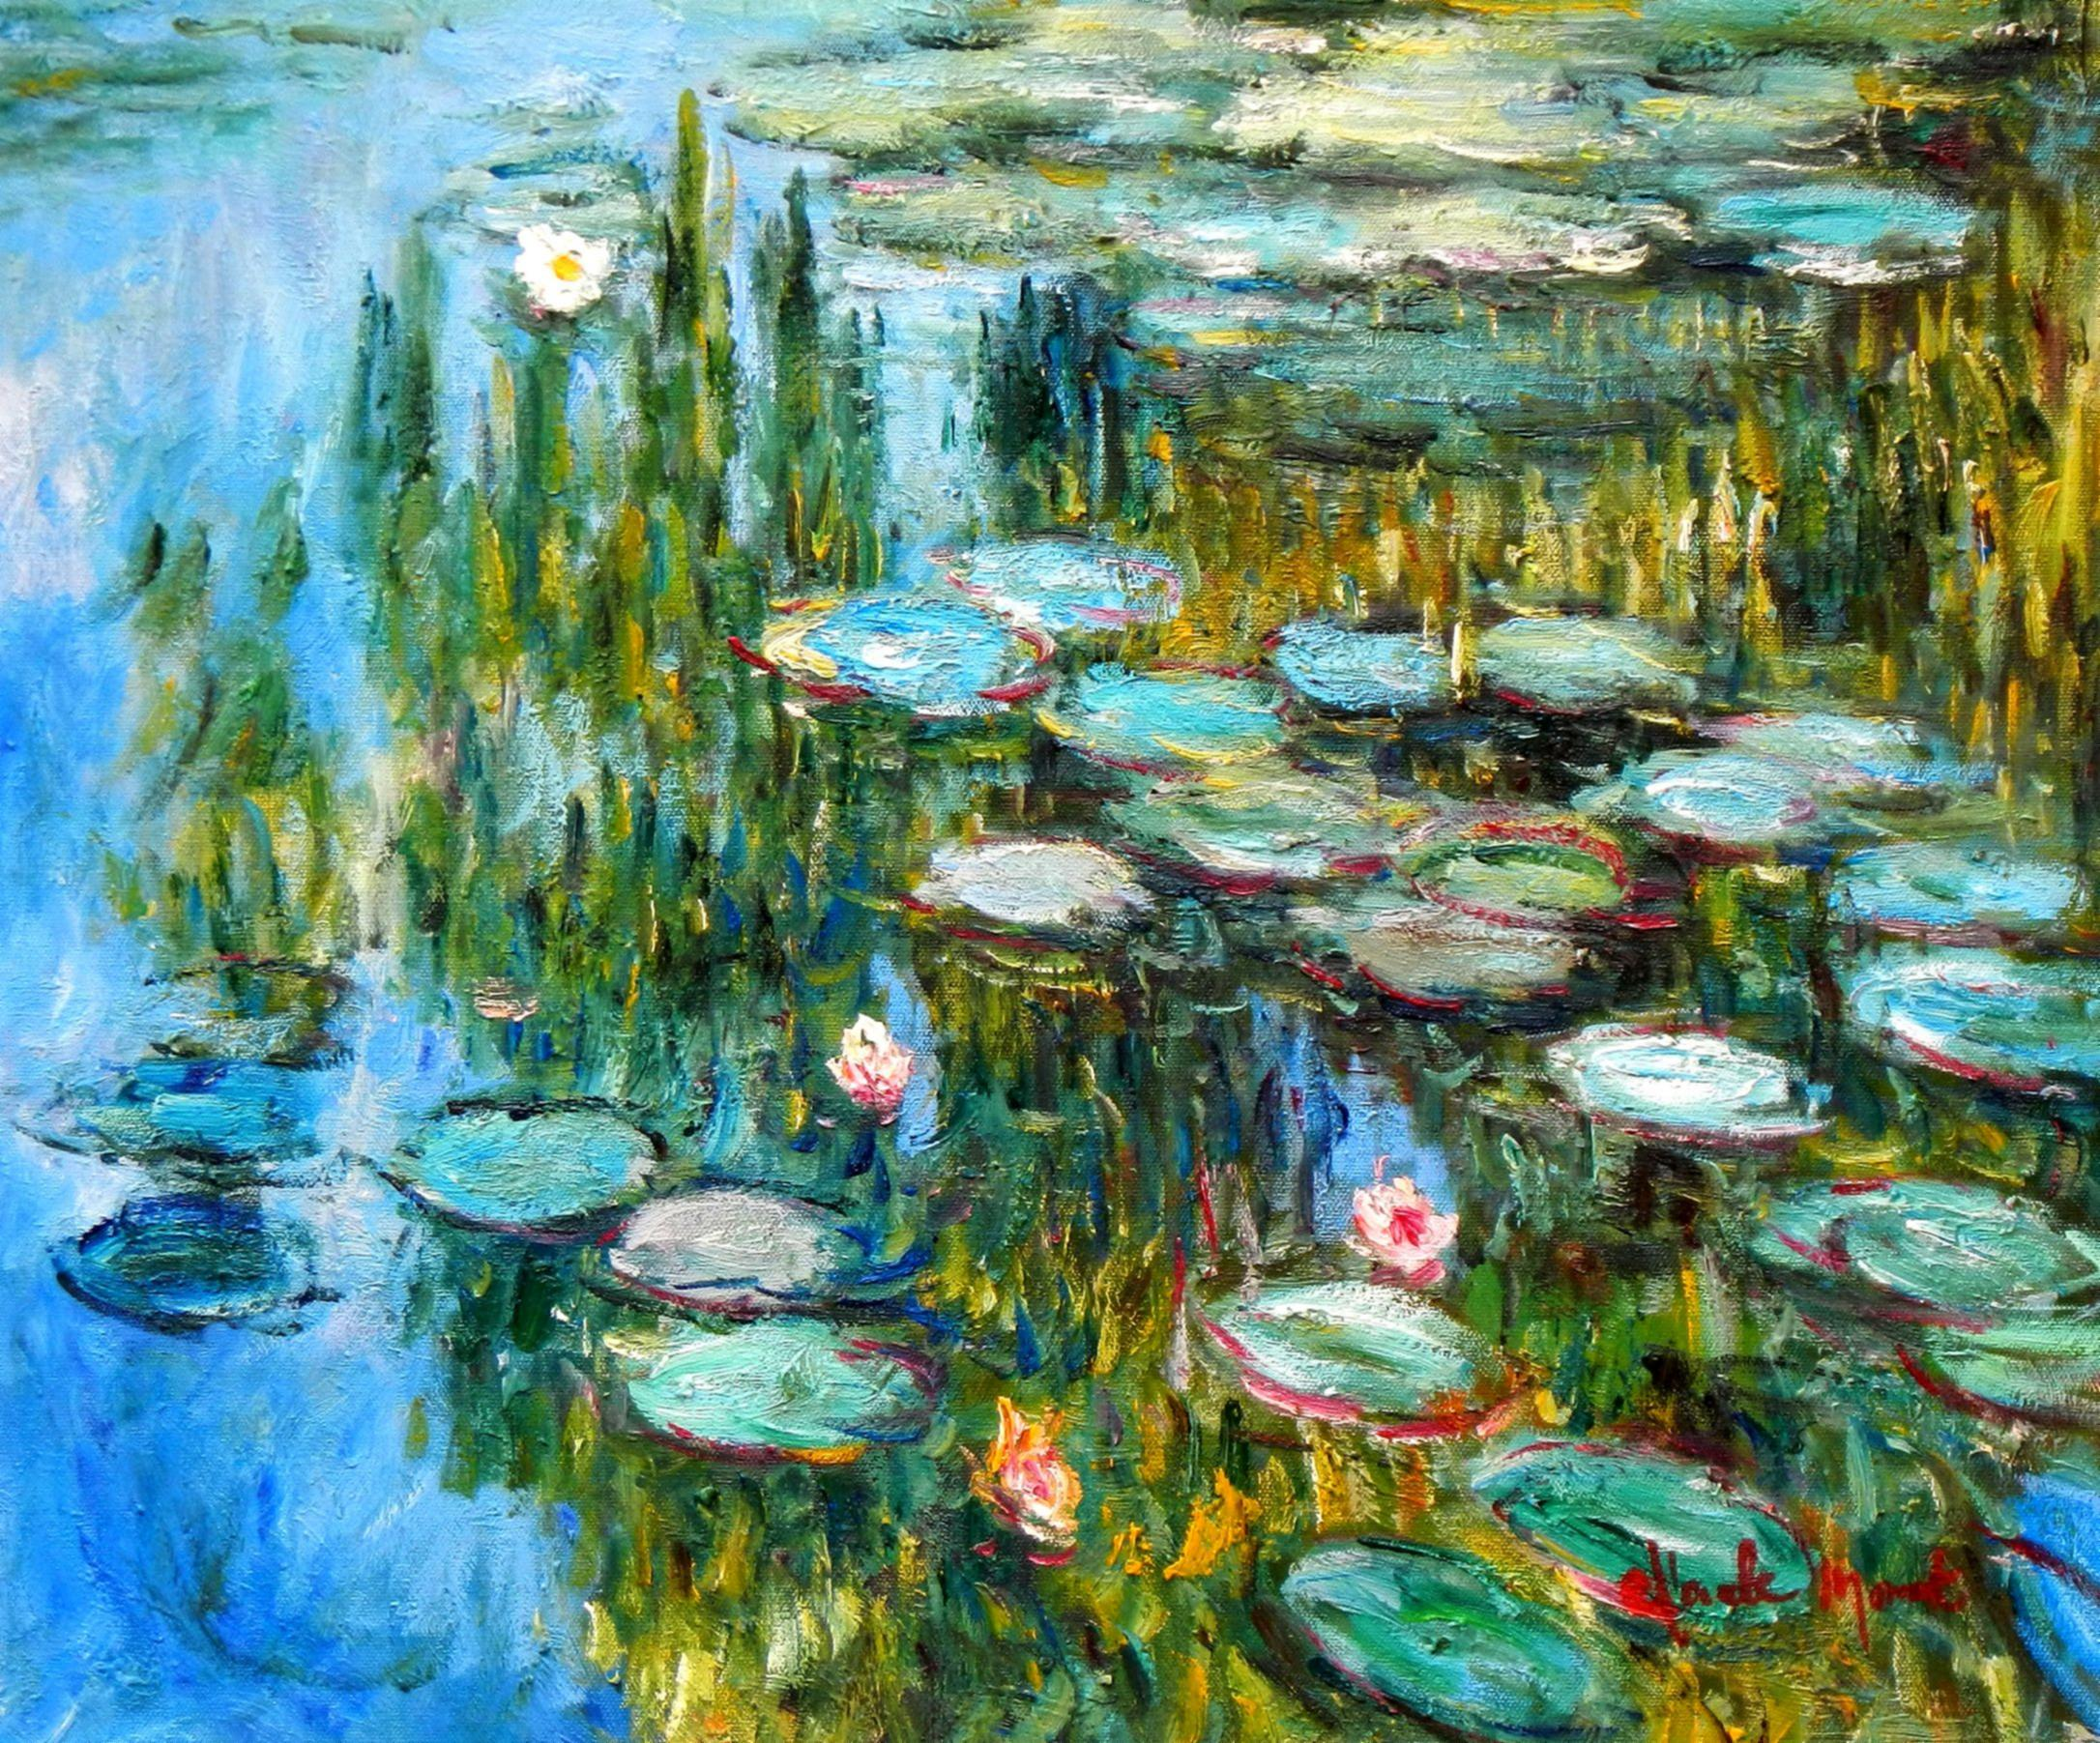 Claude Monet - Seerosen im Frühling b94173 40x50cm Ölgemälde handgemalt